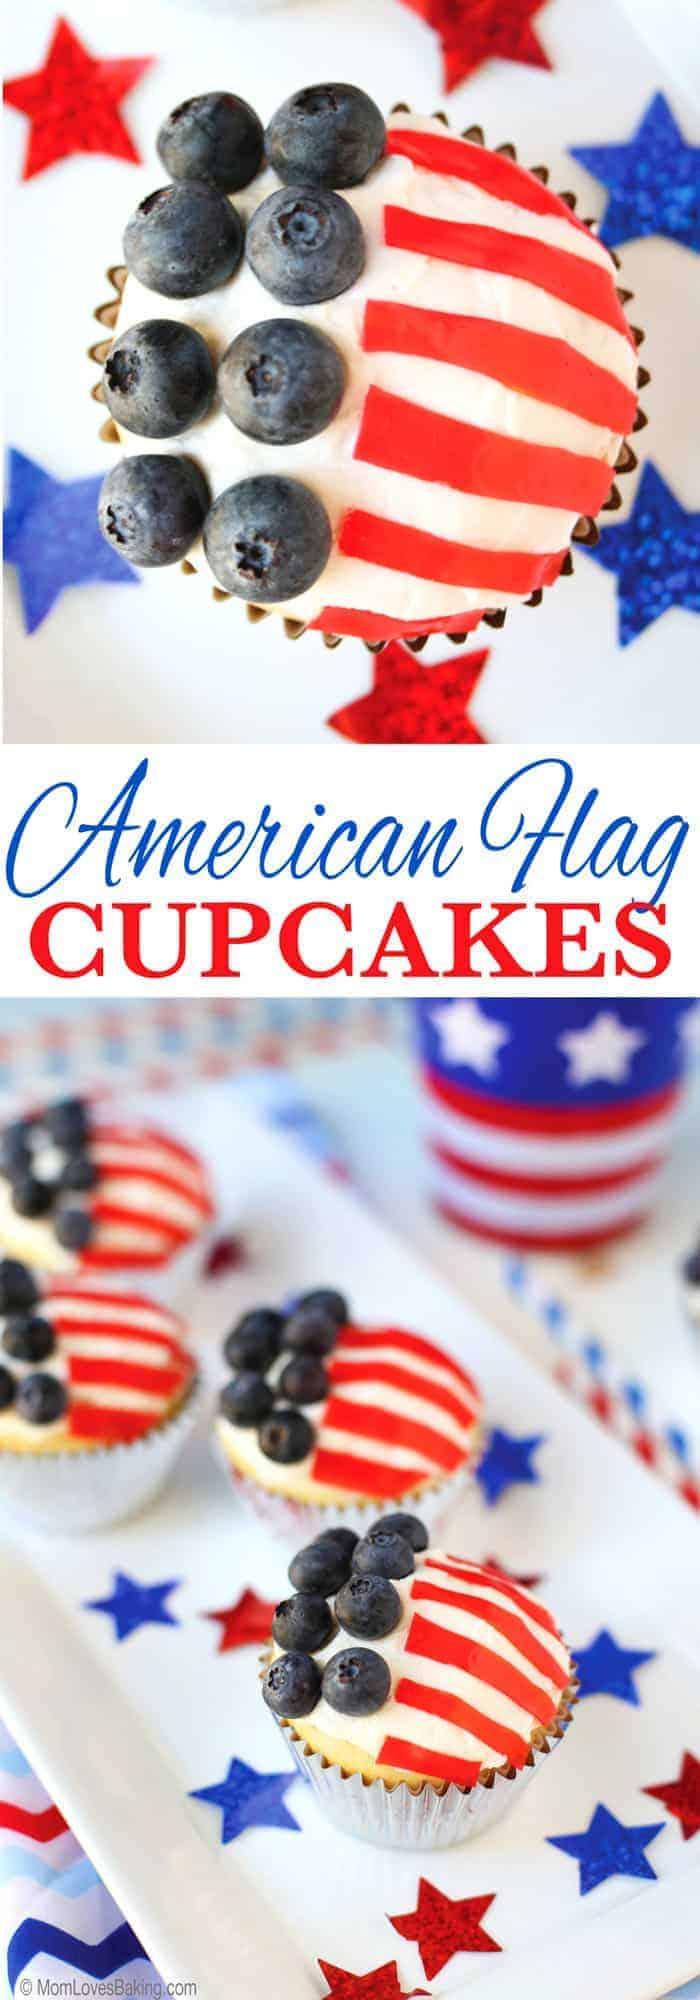 American-Flag-Cupcakes-Long